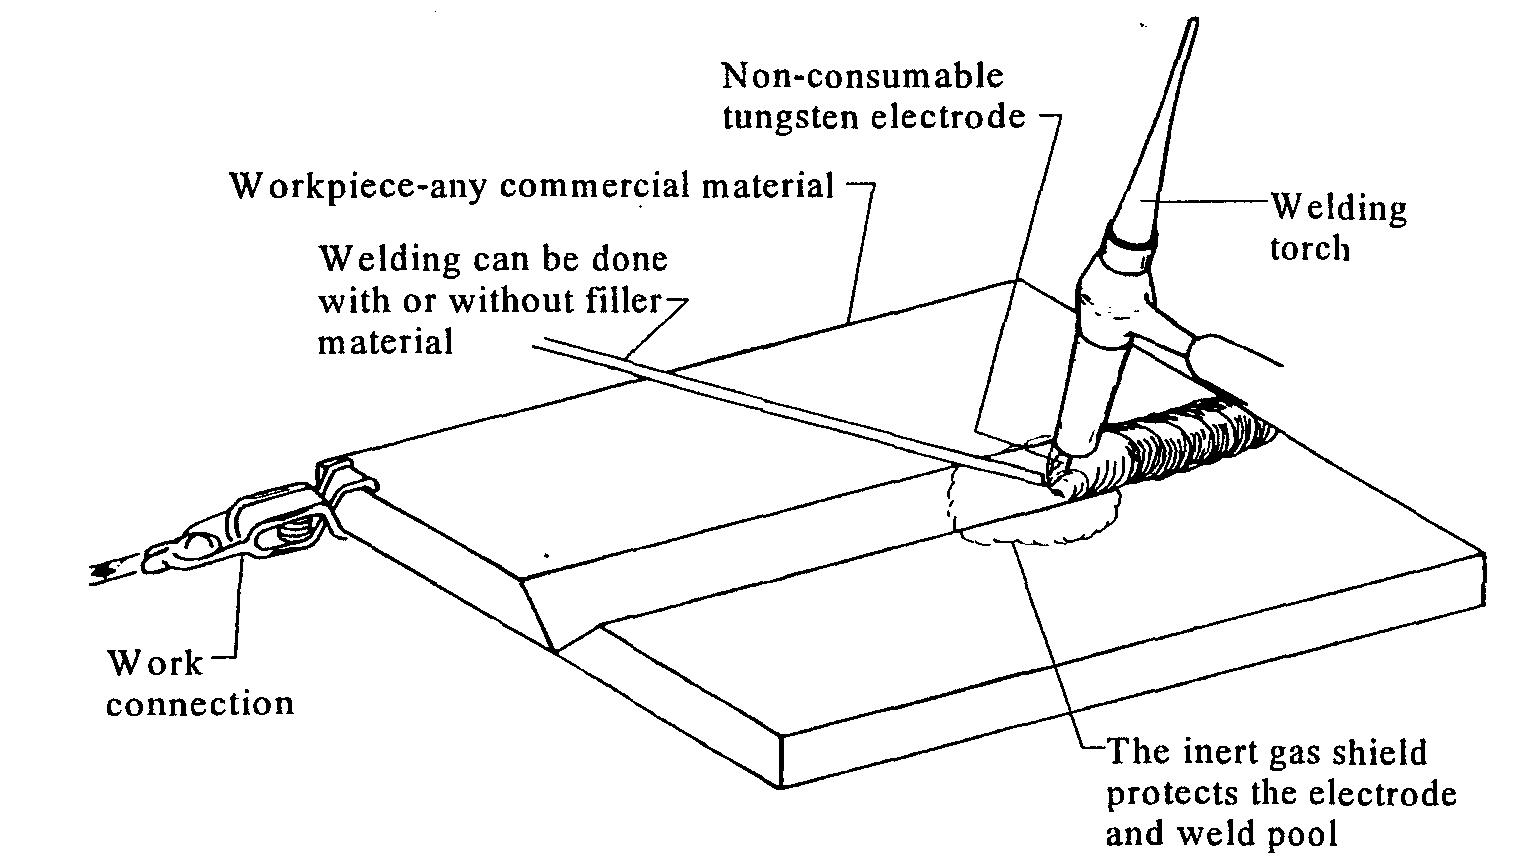 Pengelasan Argon Pengertian Las Tig Tungsten Inert Gas Welding Diagram Gambar 1 Peralatan